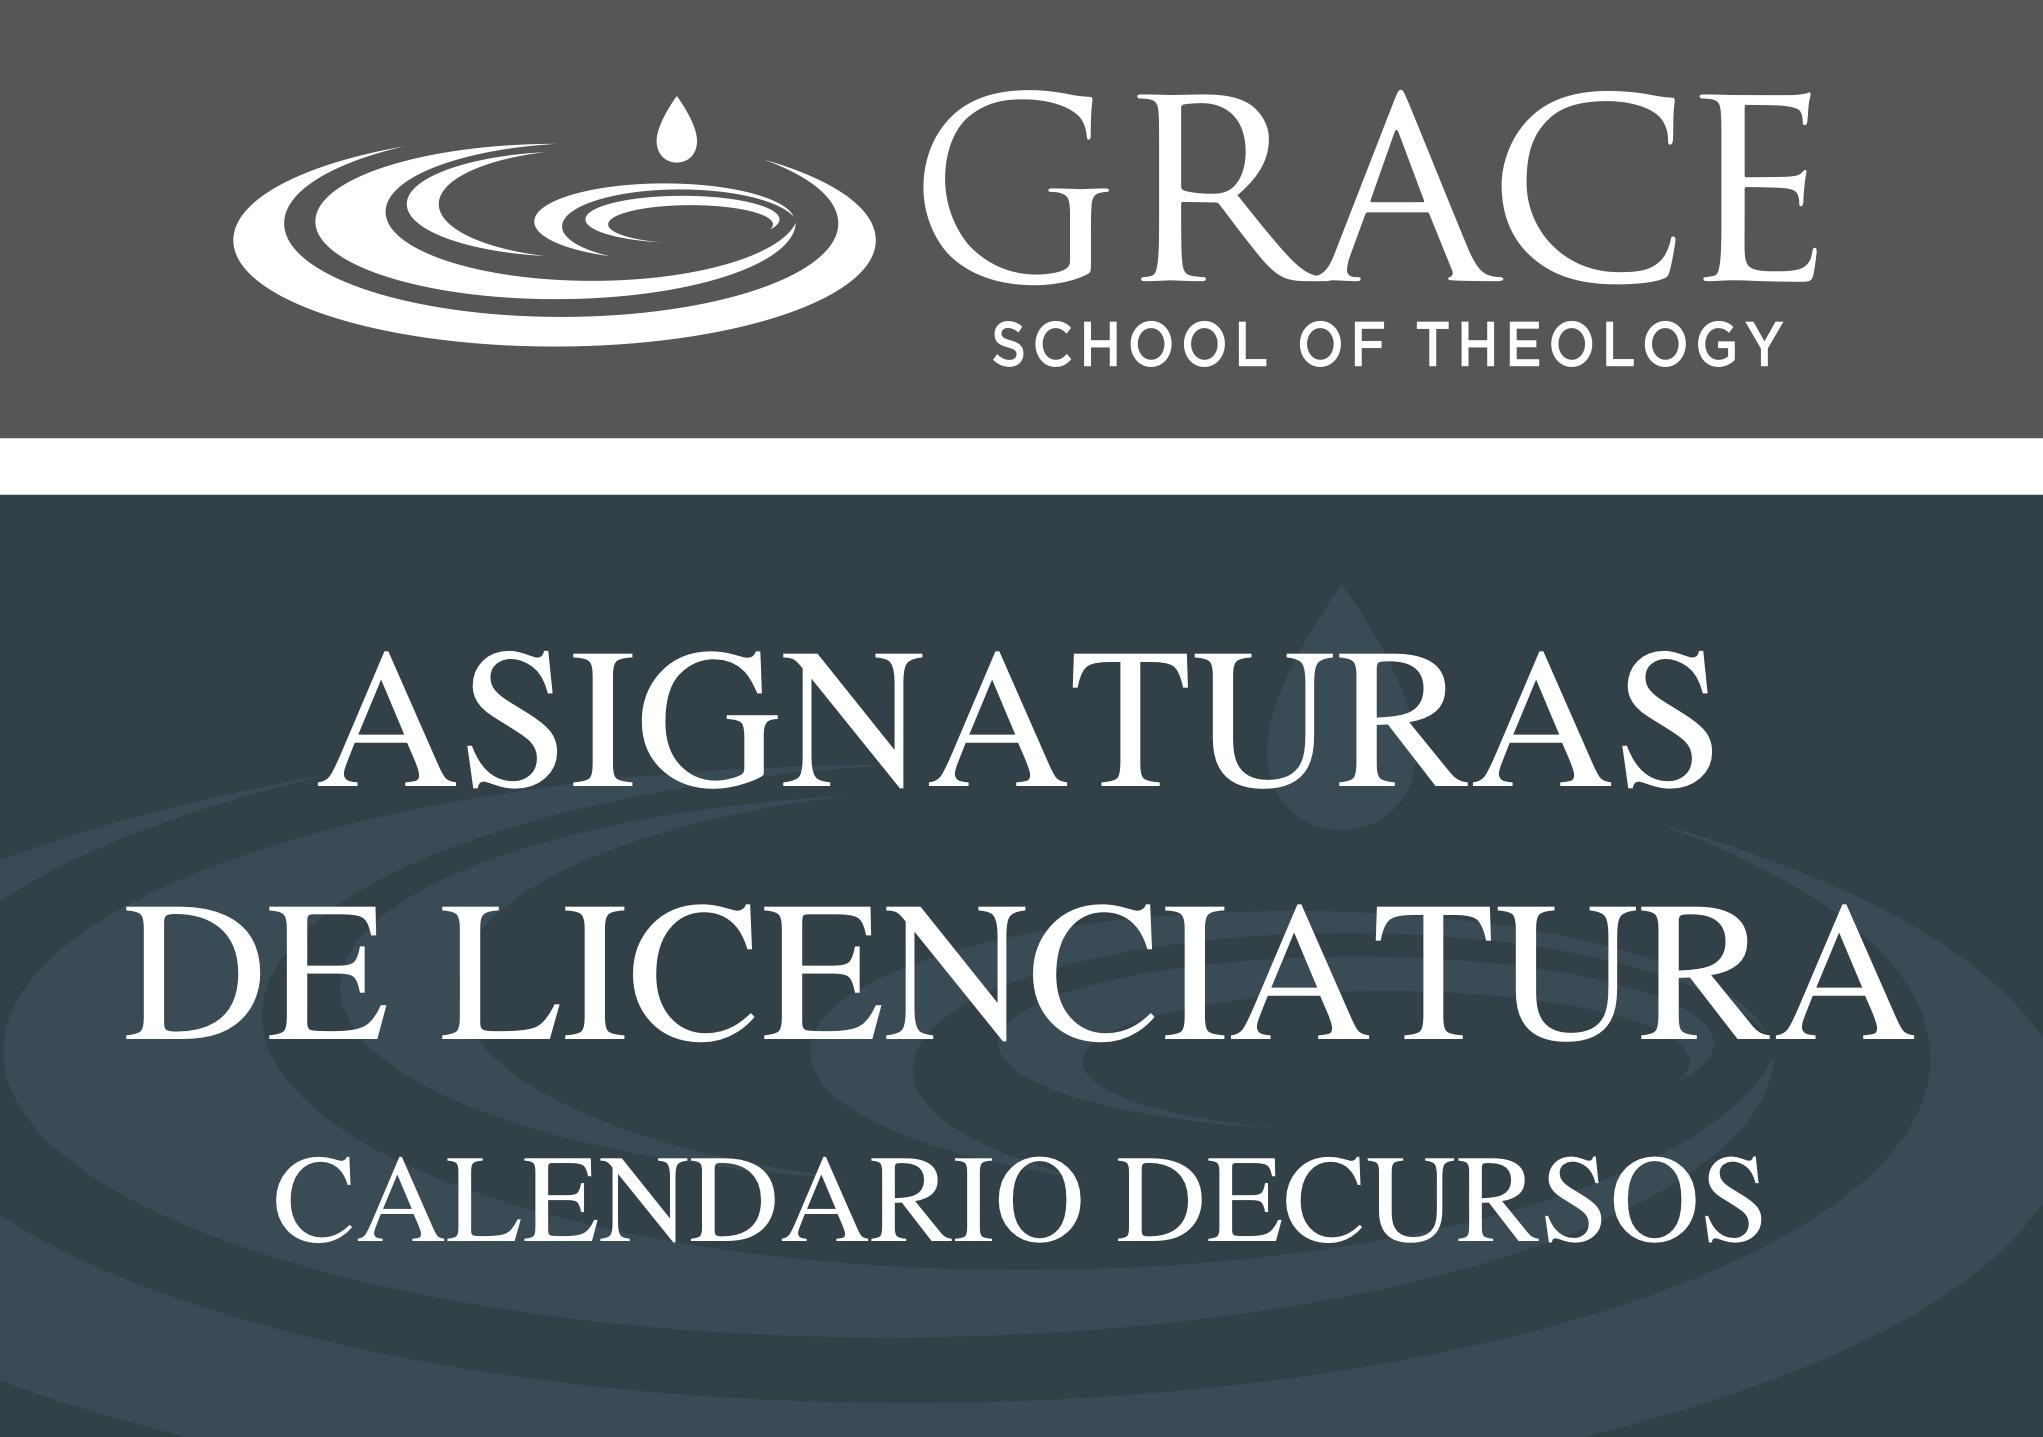 ASIGNATURAS DE LICENCIATURA